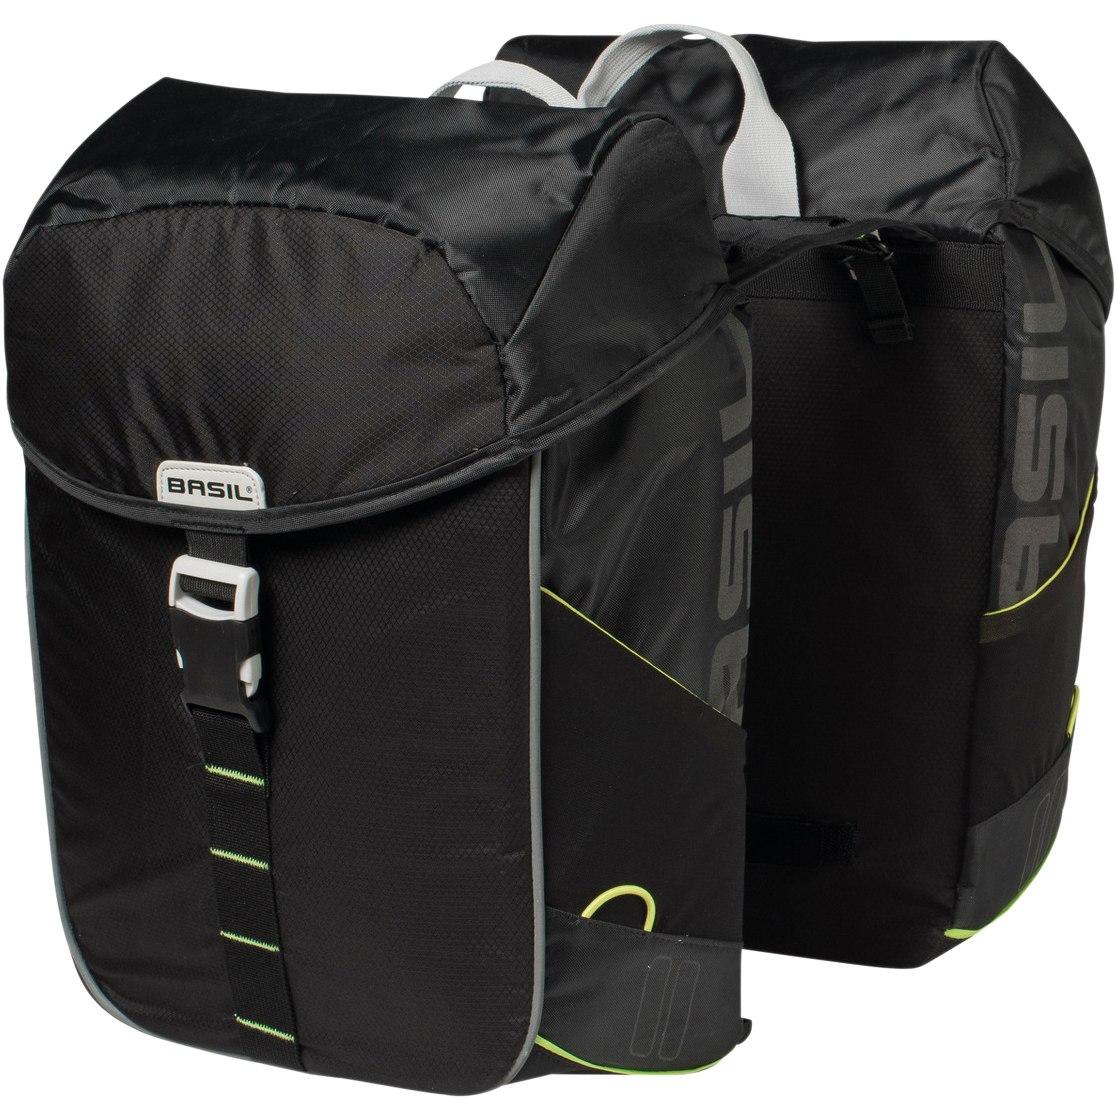 Image of Basil Miles Double Bike Bag - black